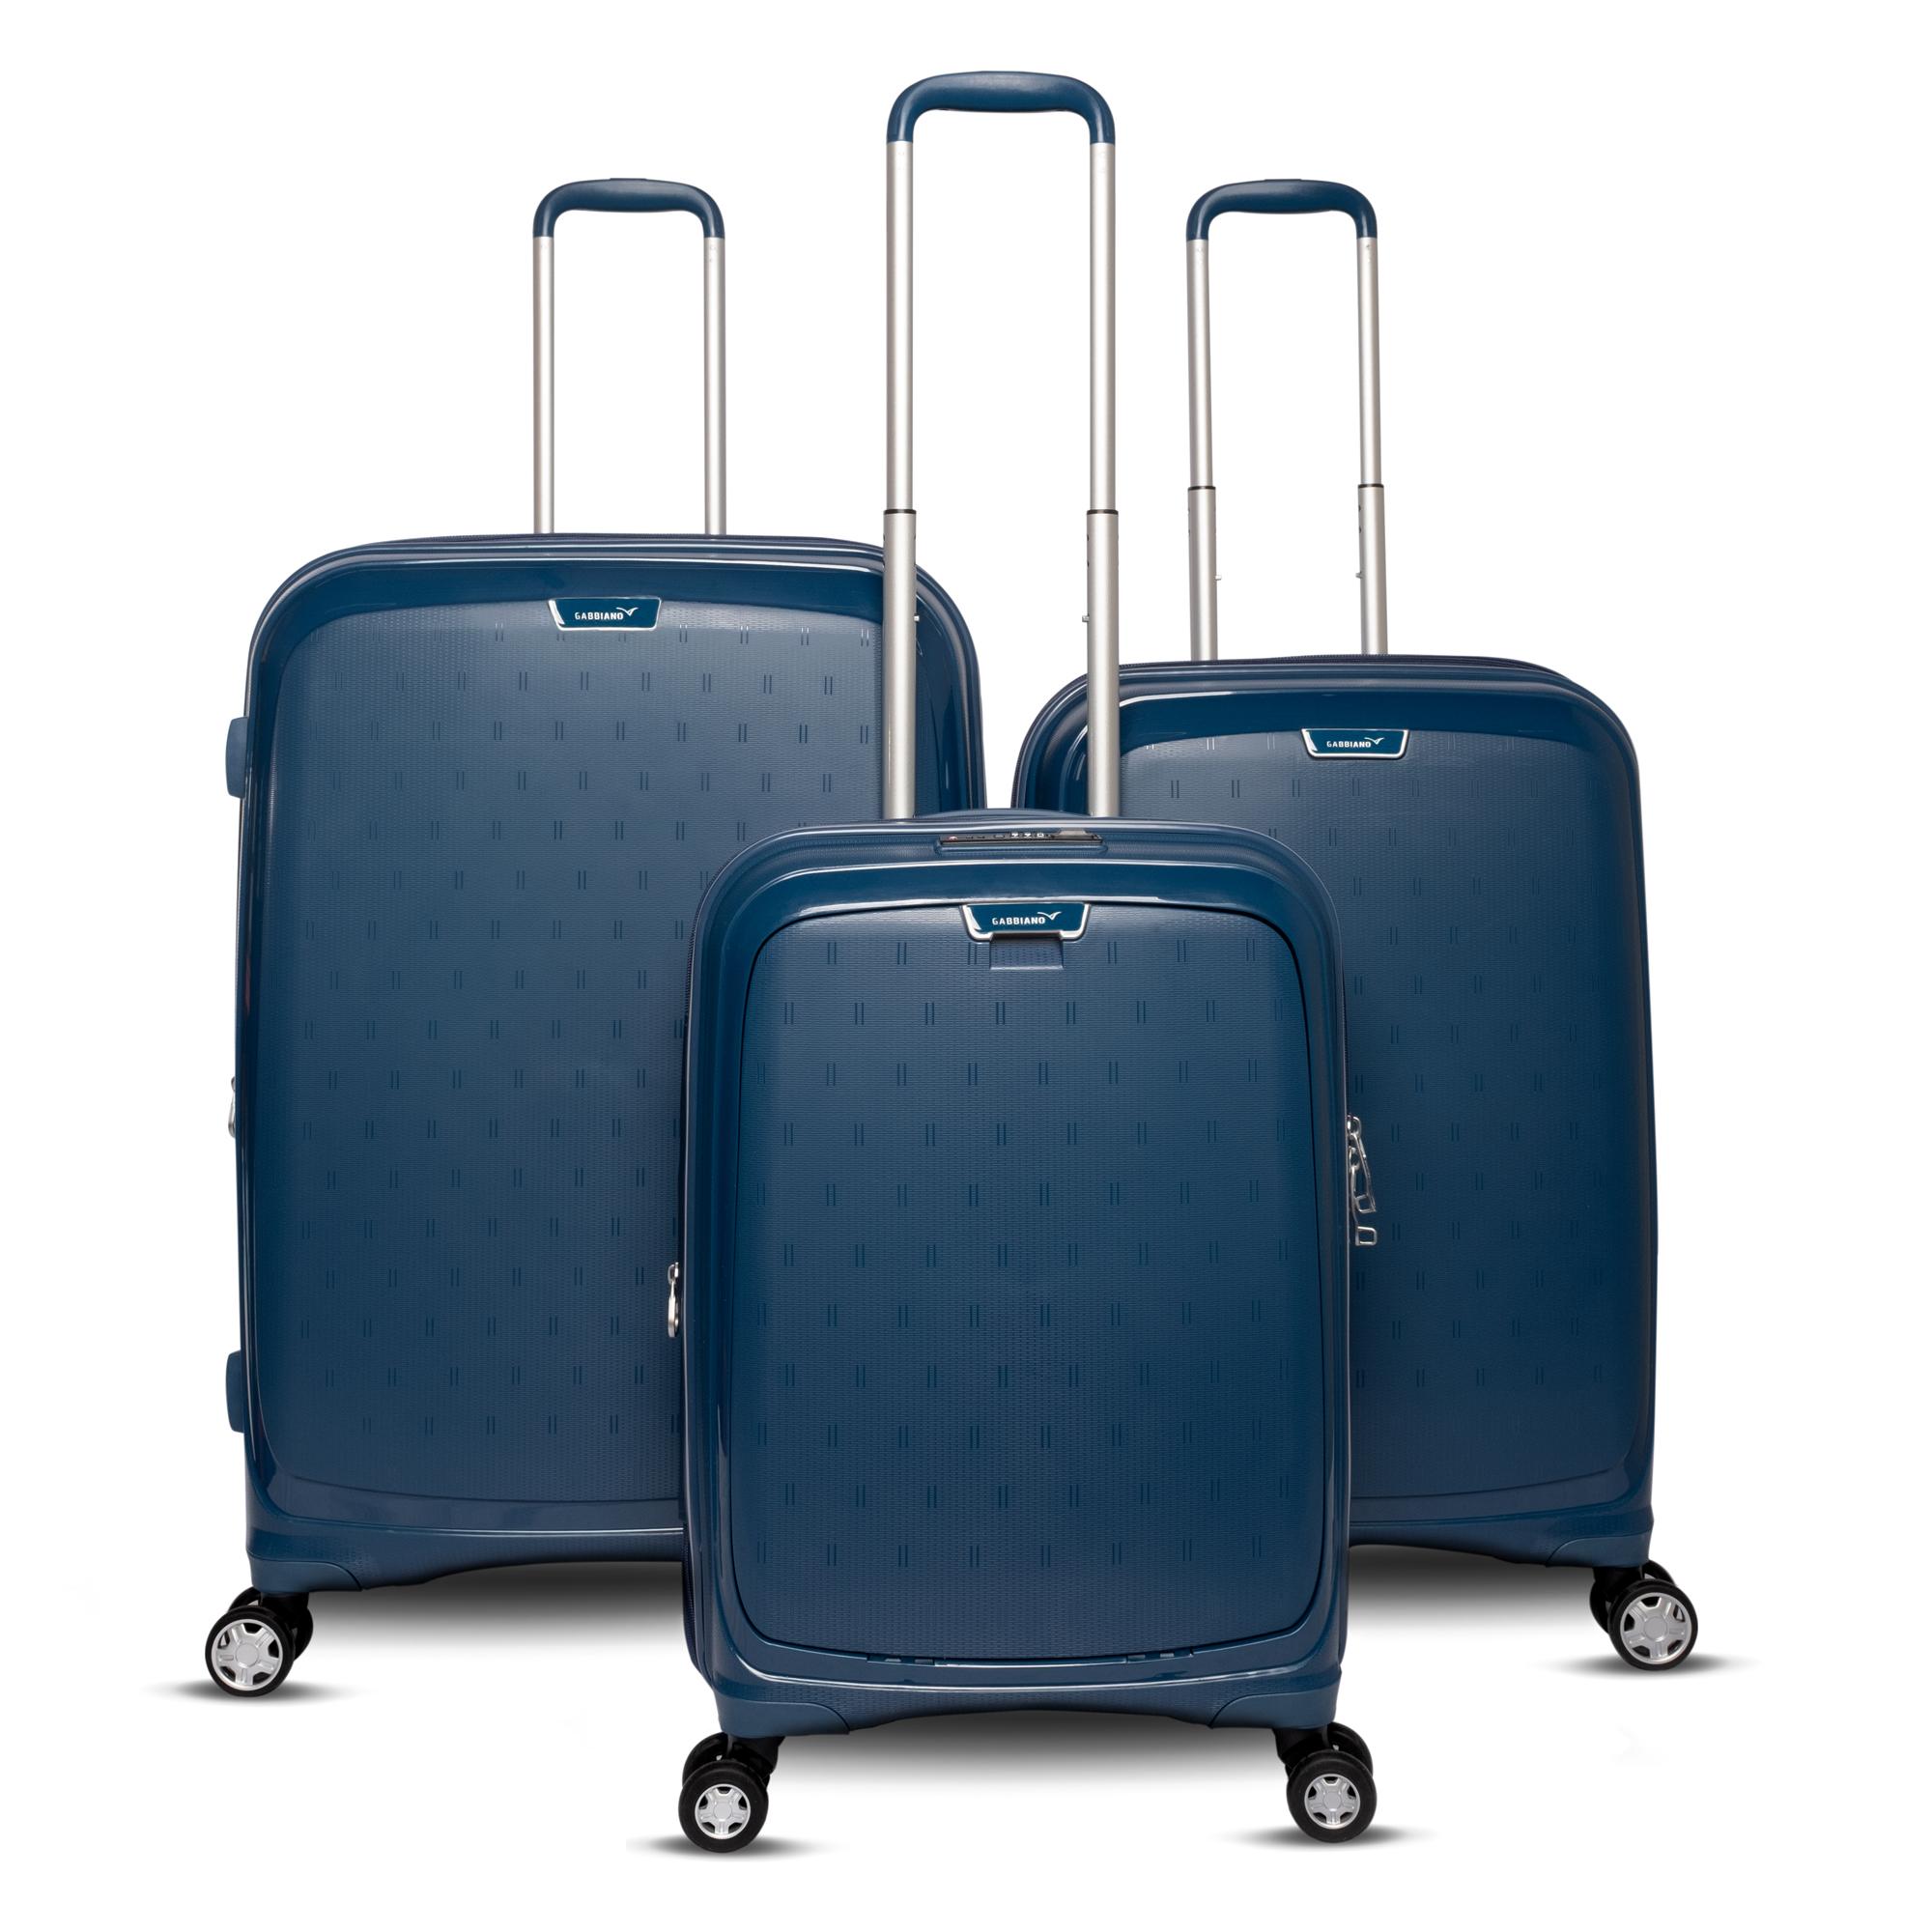 GA1150-blue-set-2k